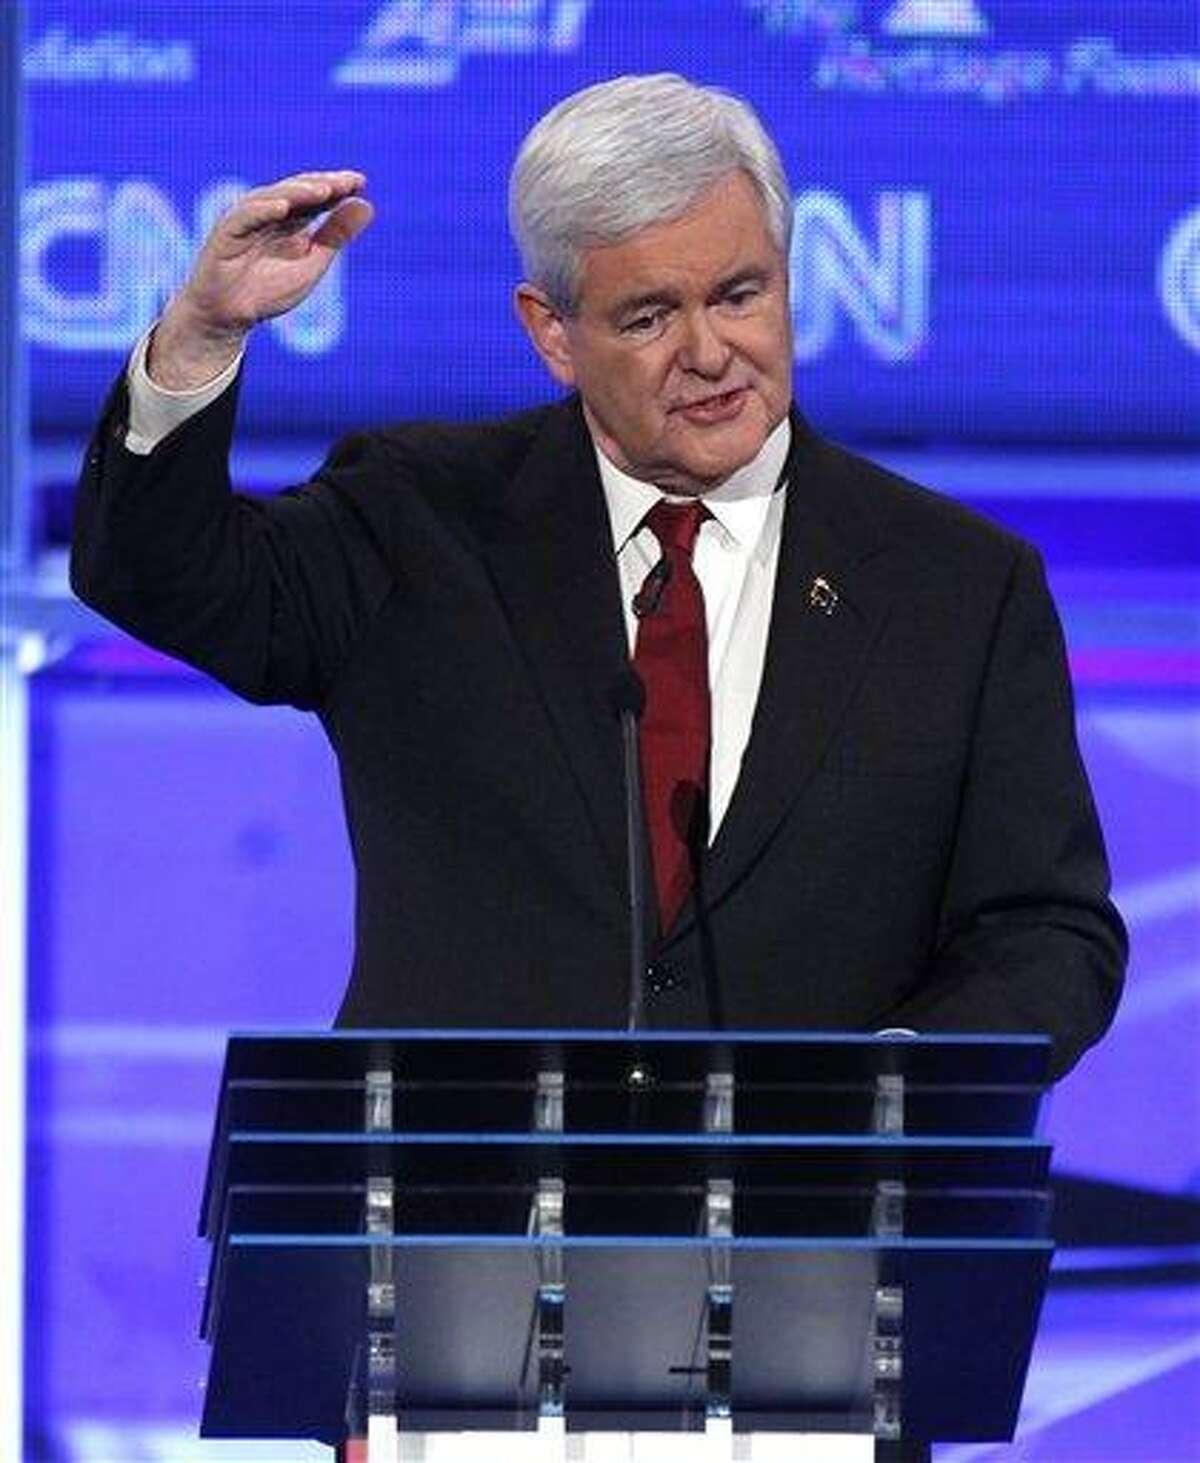 Republican presidential candidate former House Speaker Newt Gingrich speaks at a Republican presidential debate in Washington, Tuesday, Nov. 22, 2011. (AP Photo/Evan Vucci)